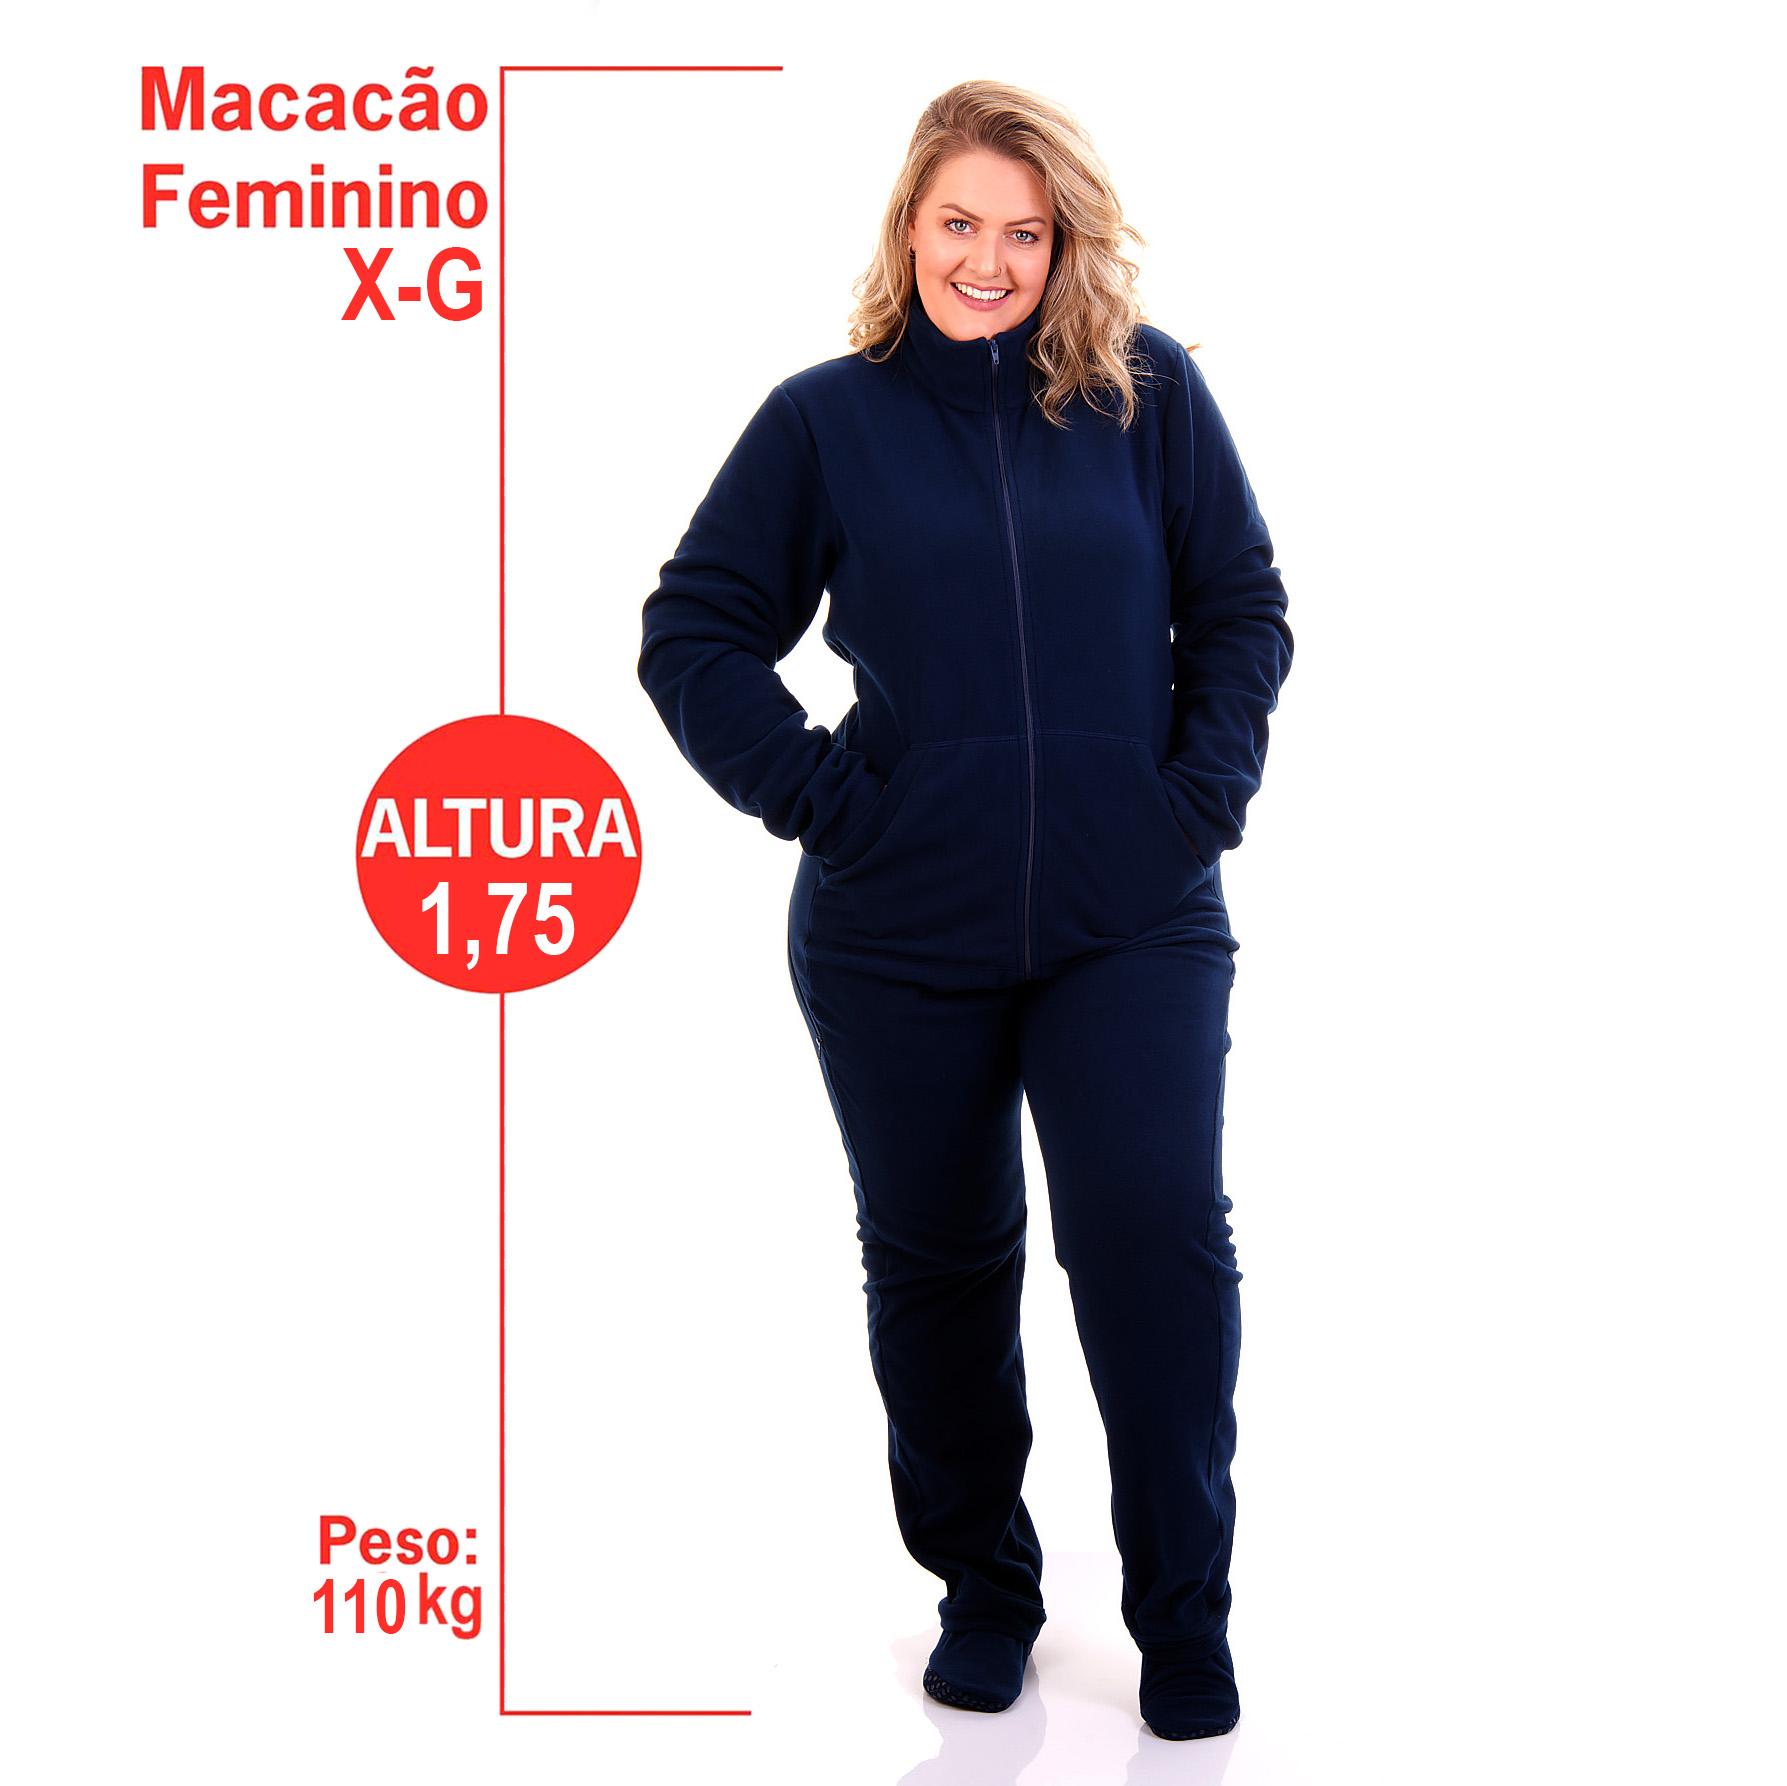 2 PEÇAS - TAL MÃE TAL FILHO (A) MACACÃO